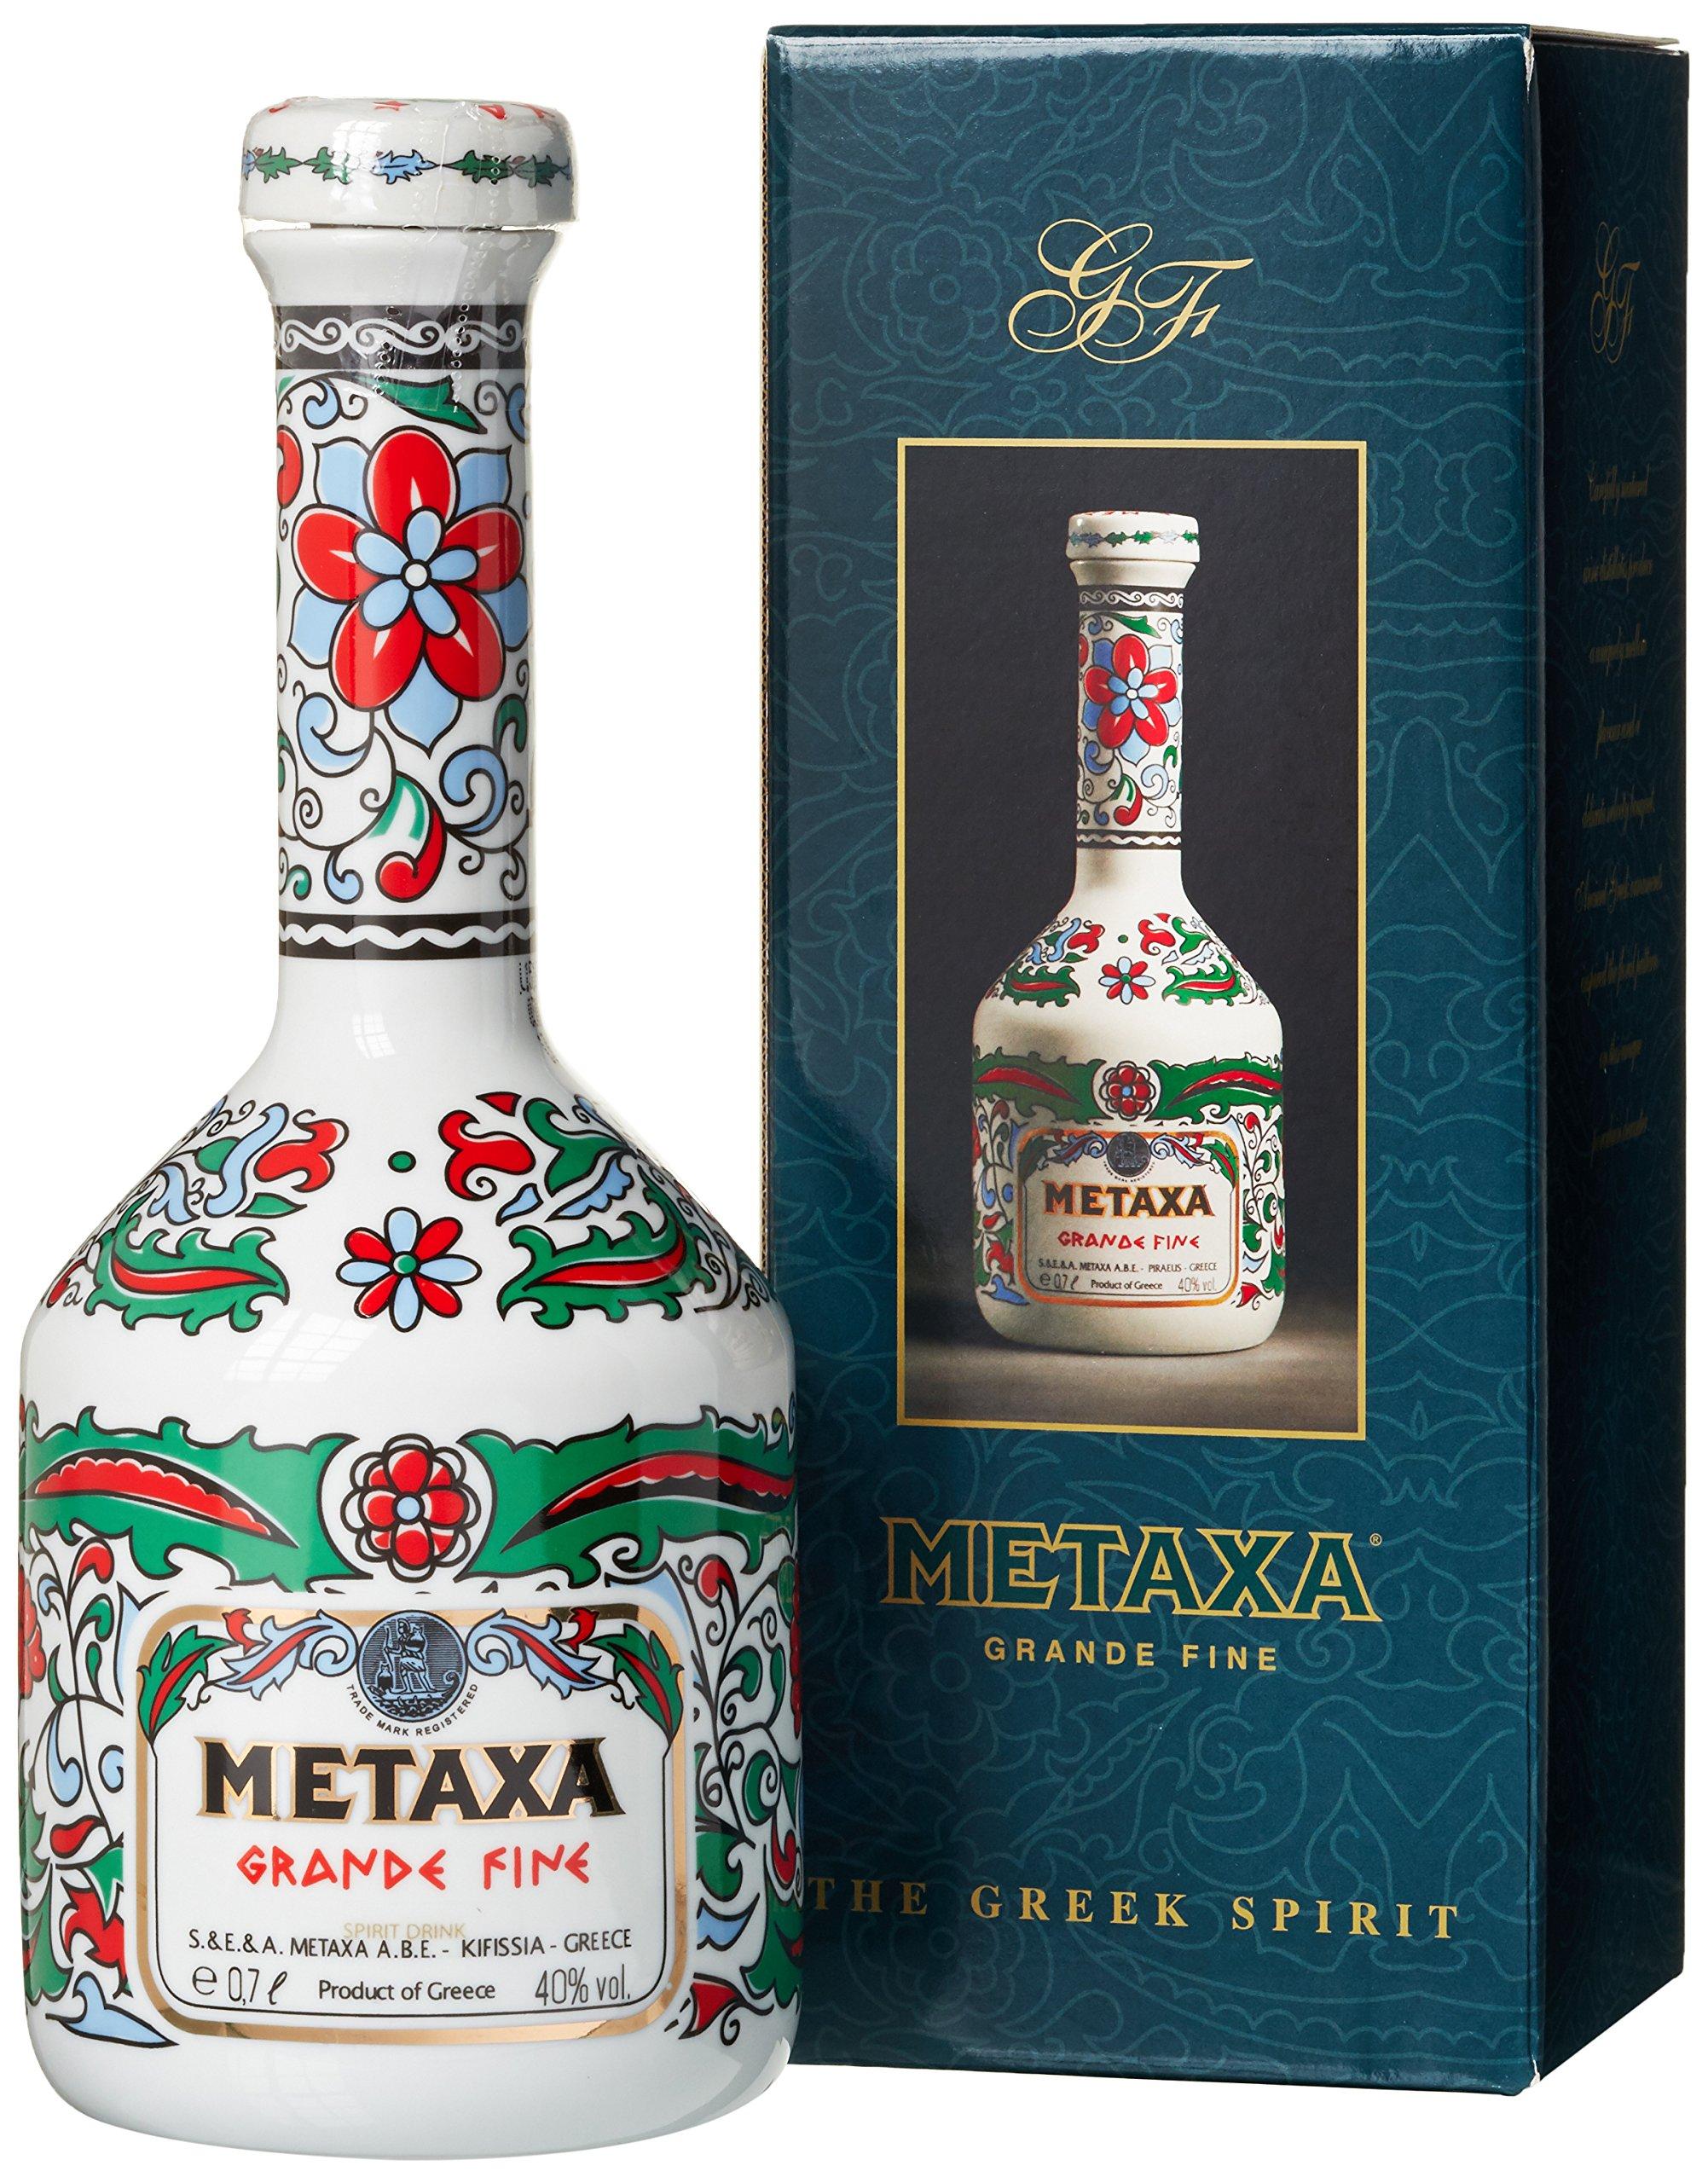 Metaxa Grande Fine Brandy Griechischer Weinbrand in weiss-bunter Karaffe (1 x 0.7 l) Bild